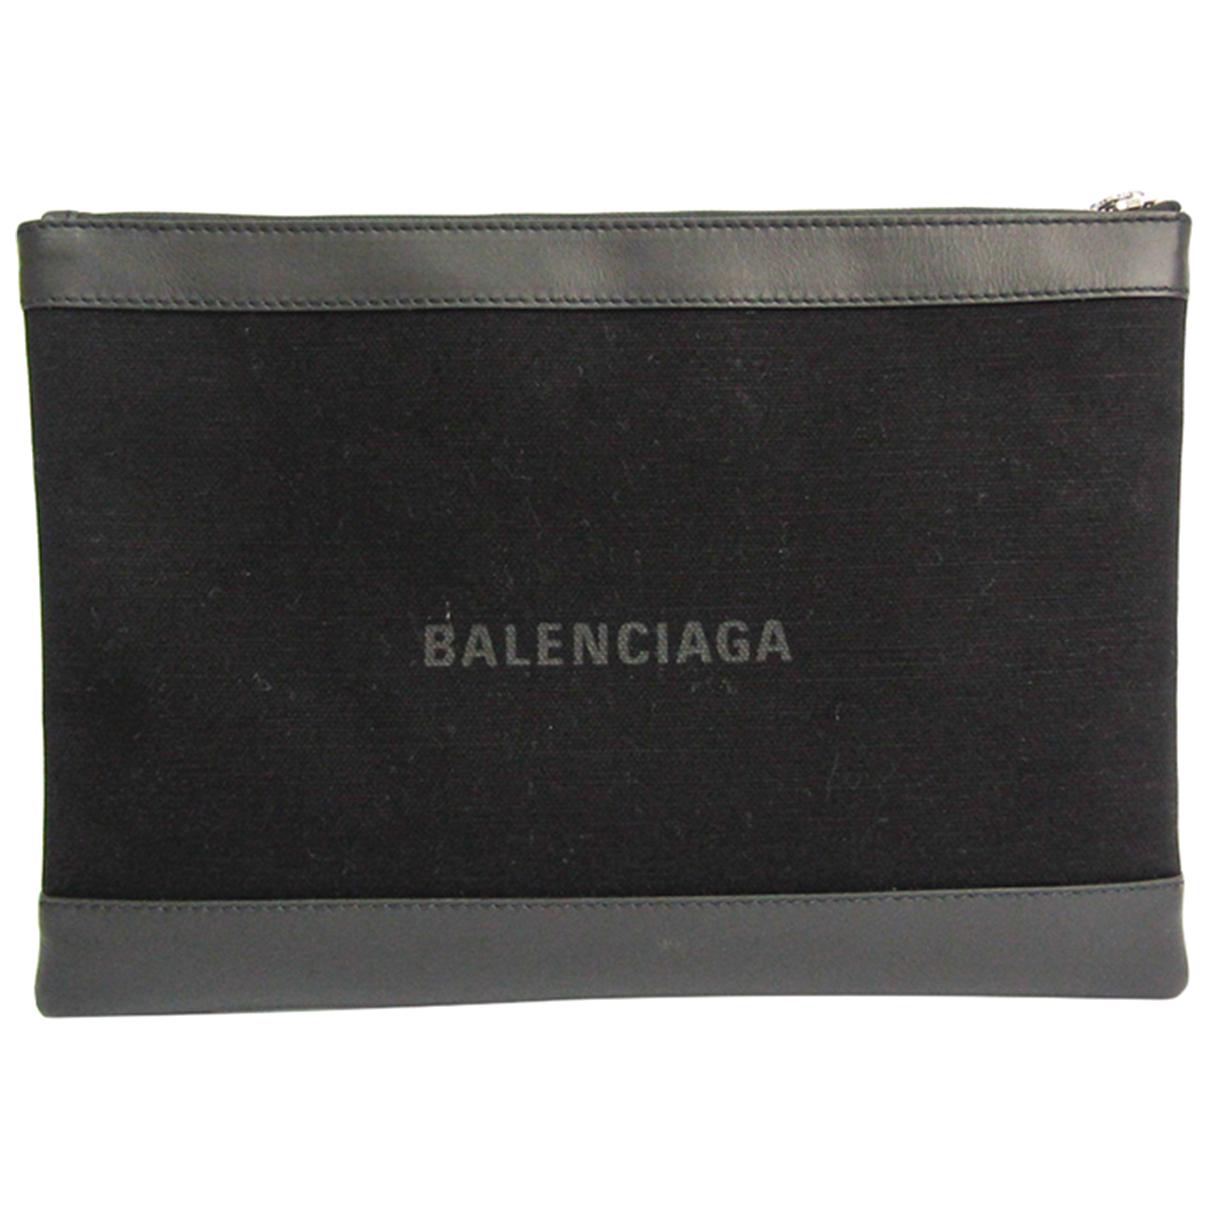 Balenciaga \N Clutch in  Schwarz Leinen